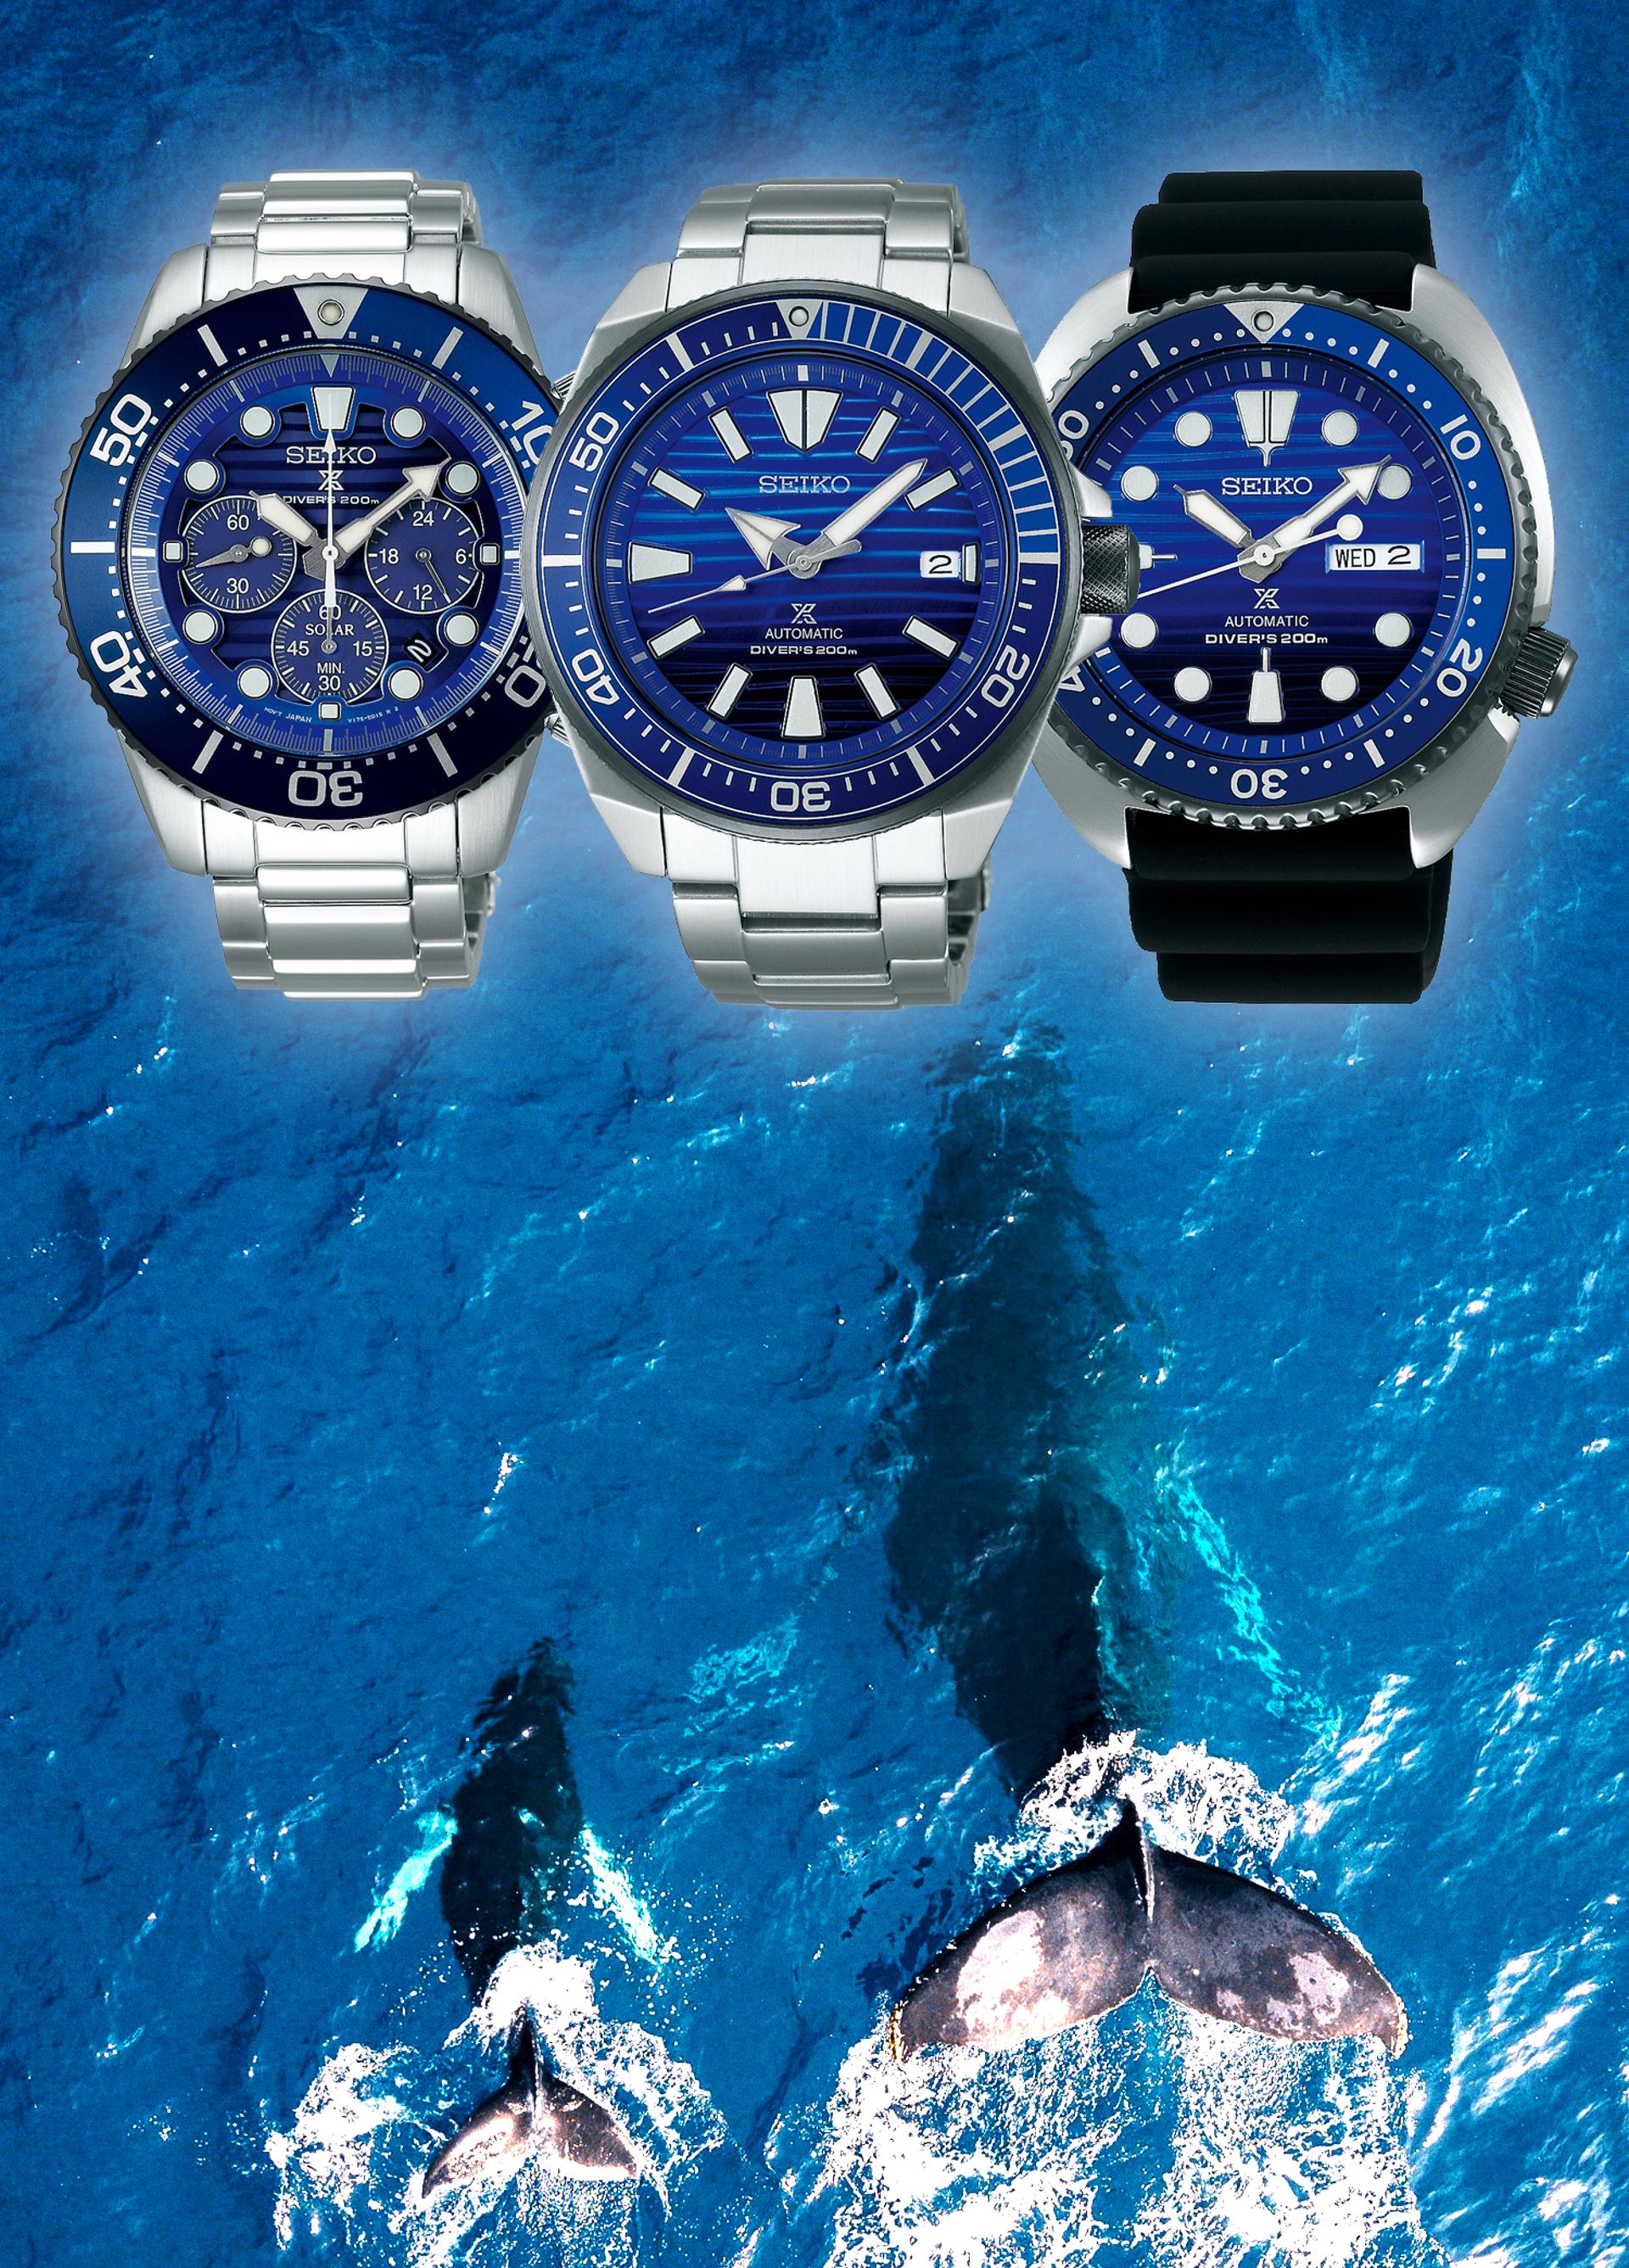 Seiko Prospex Save the Ocean Solar Chronograph SSC675P1, Automatikuhren SRPC93K1 und SRPC91K1